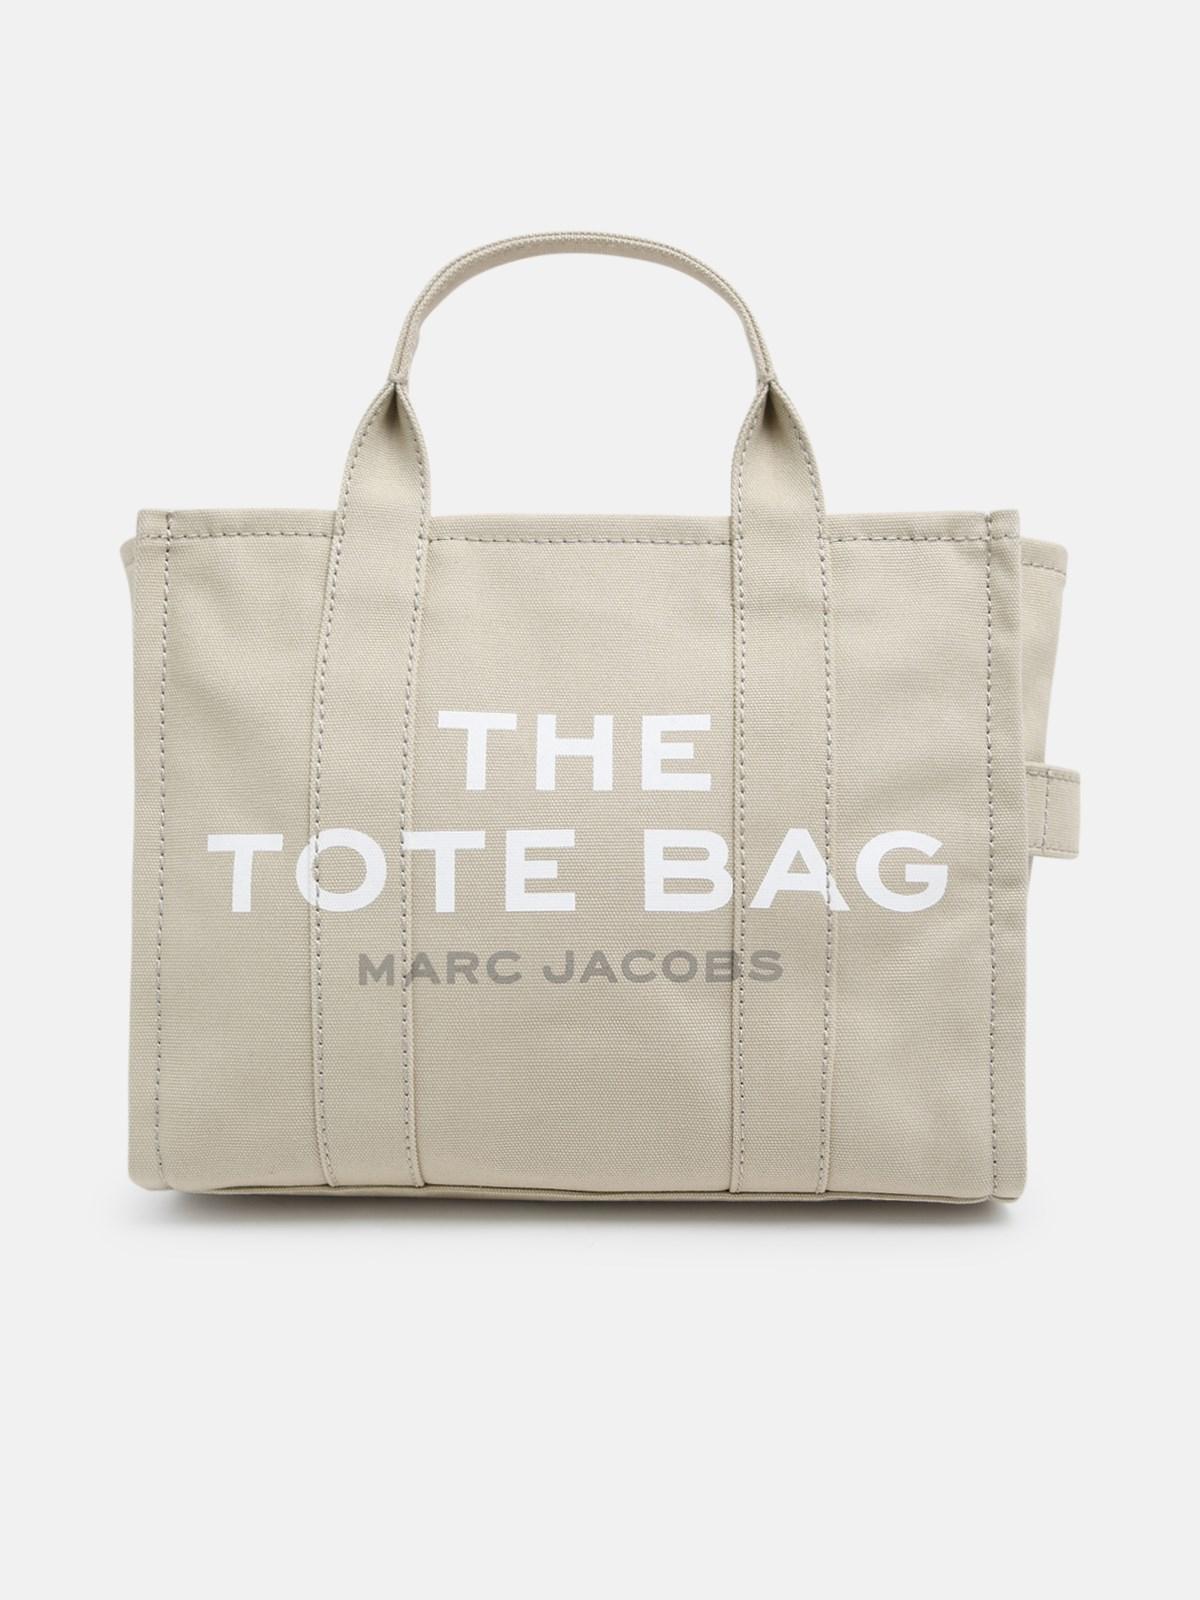 Marc Jacobs (the) Borsa Traveler Piccola Beige